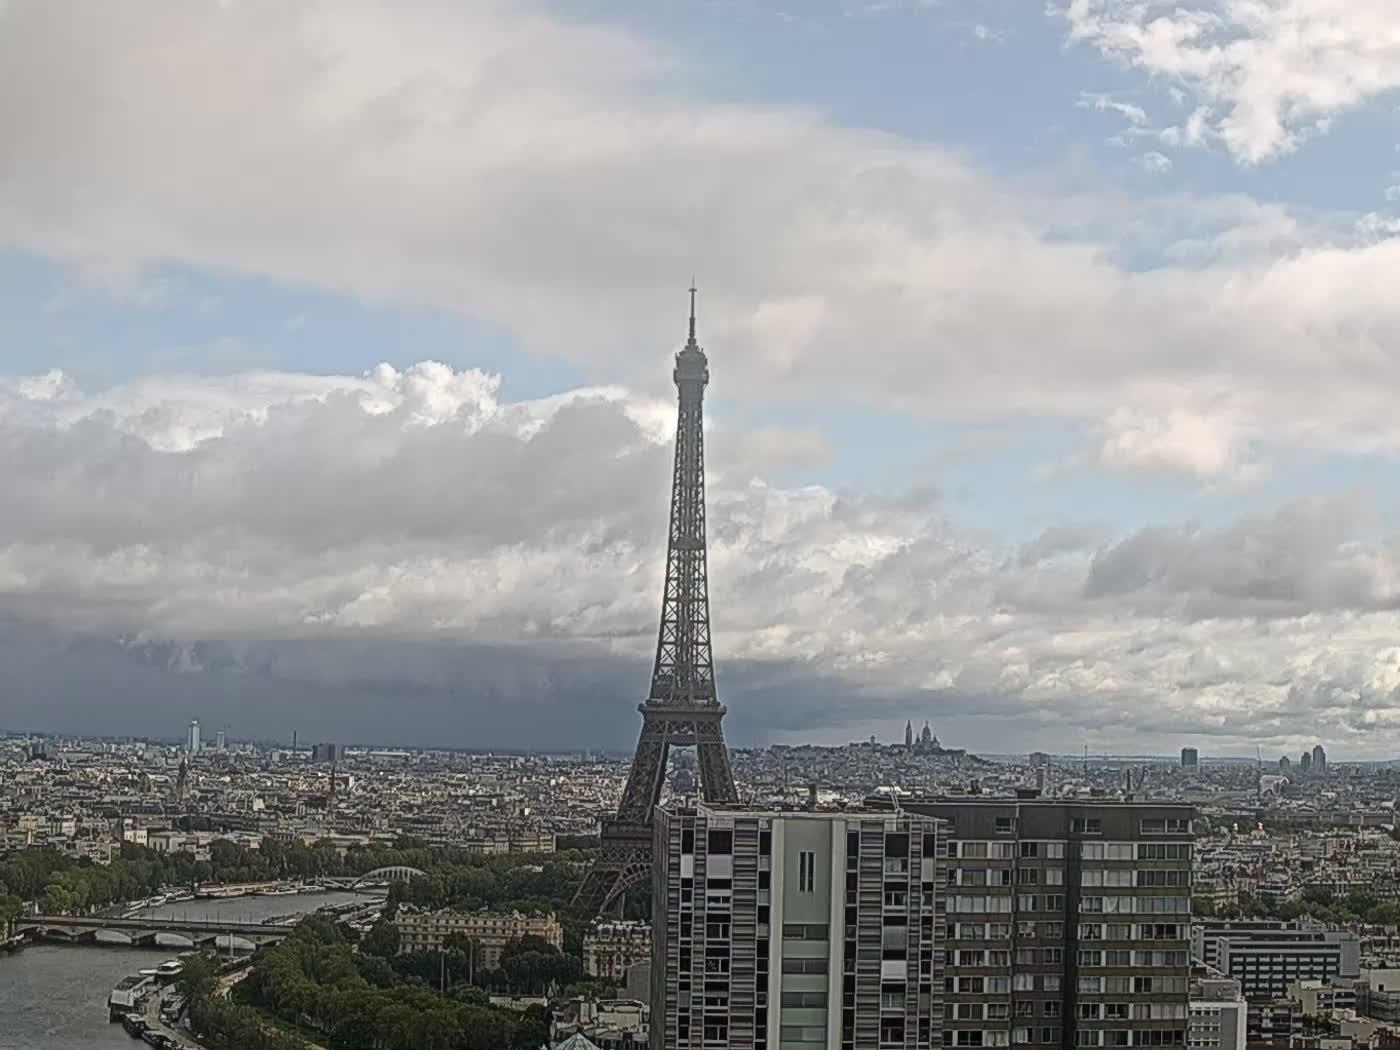 Paris Thu. 10:22